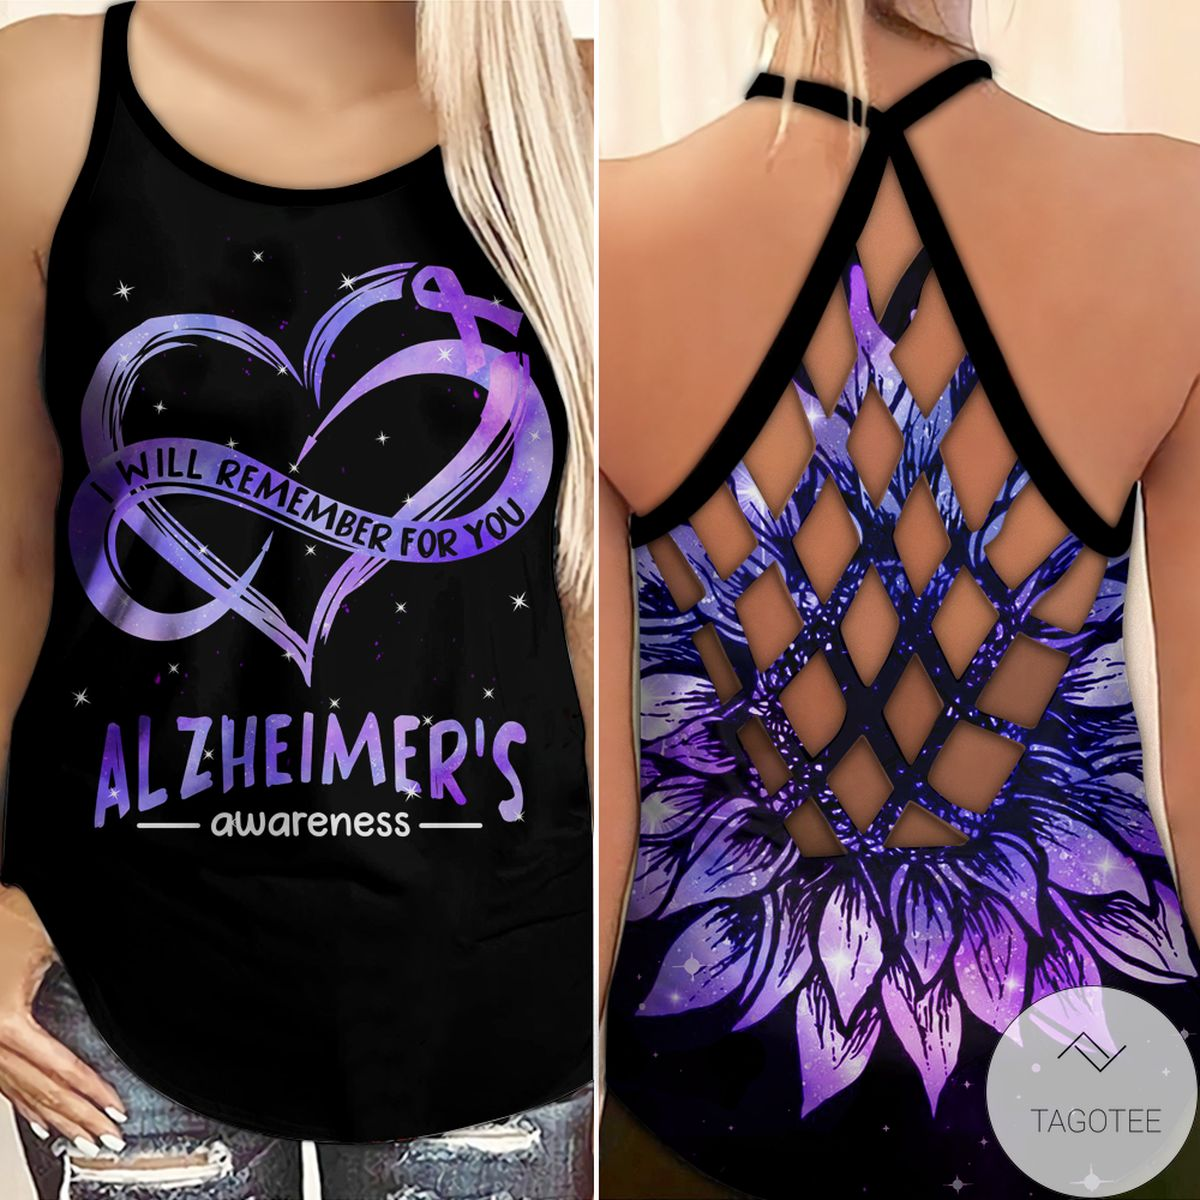 Alzheimer's Awareness Summer I Will Remember For You Criss Cross Tank Top